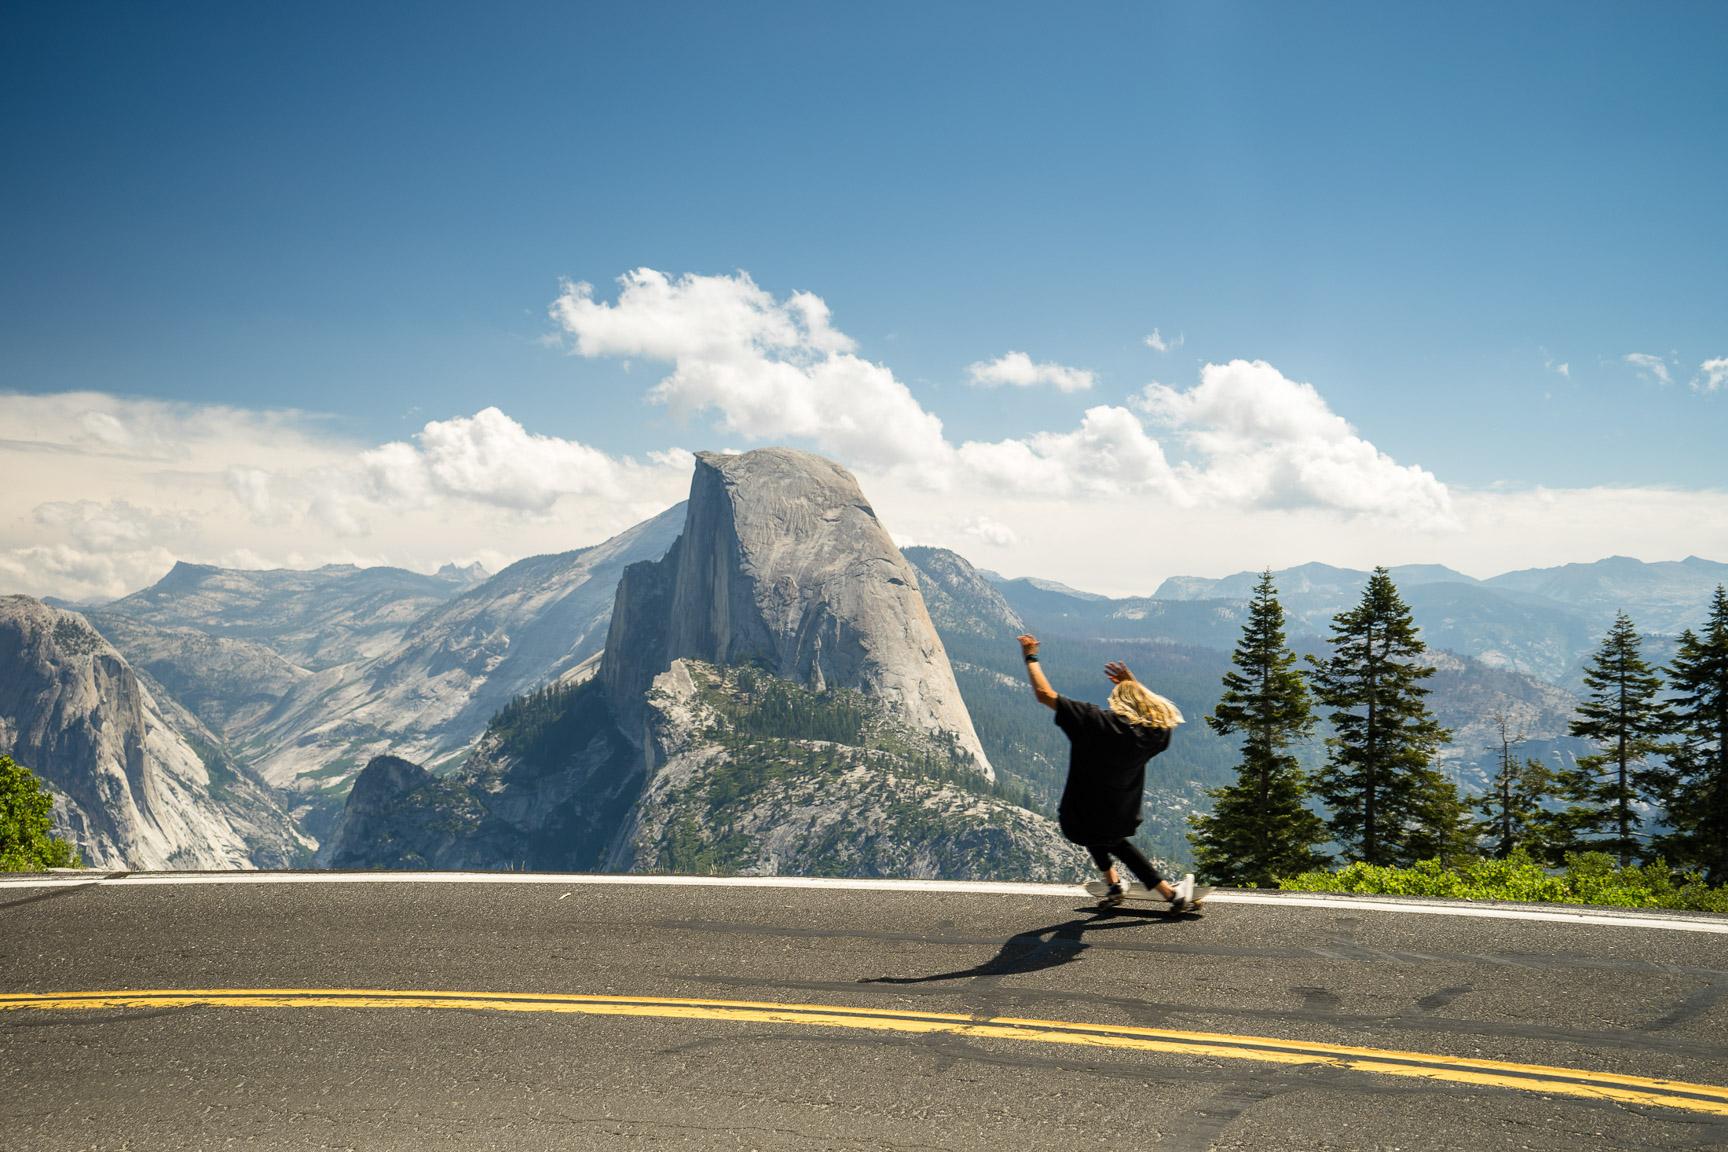 Russell Holliday, Yosemite, California